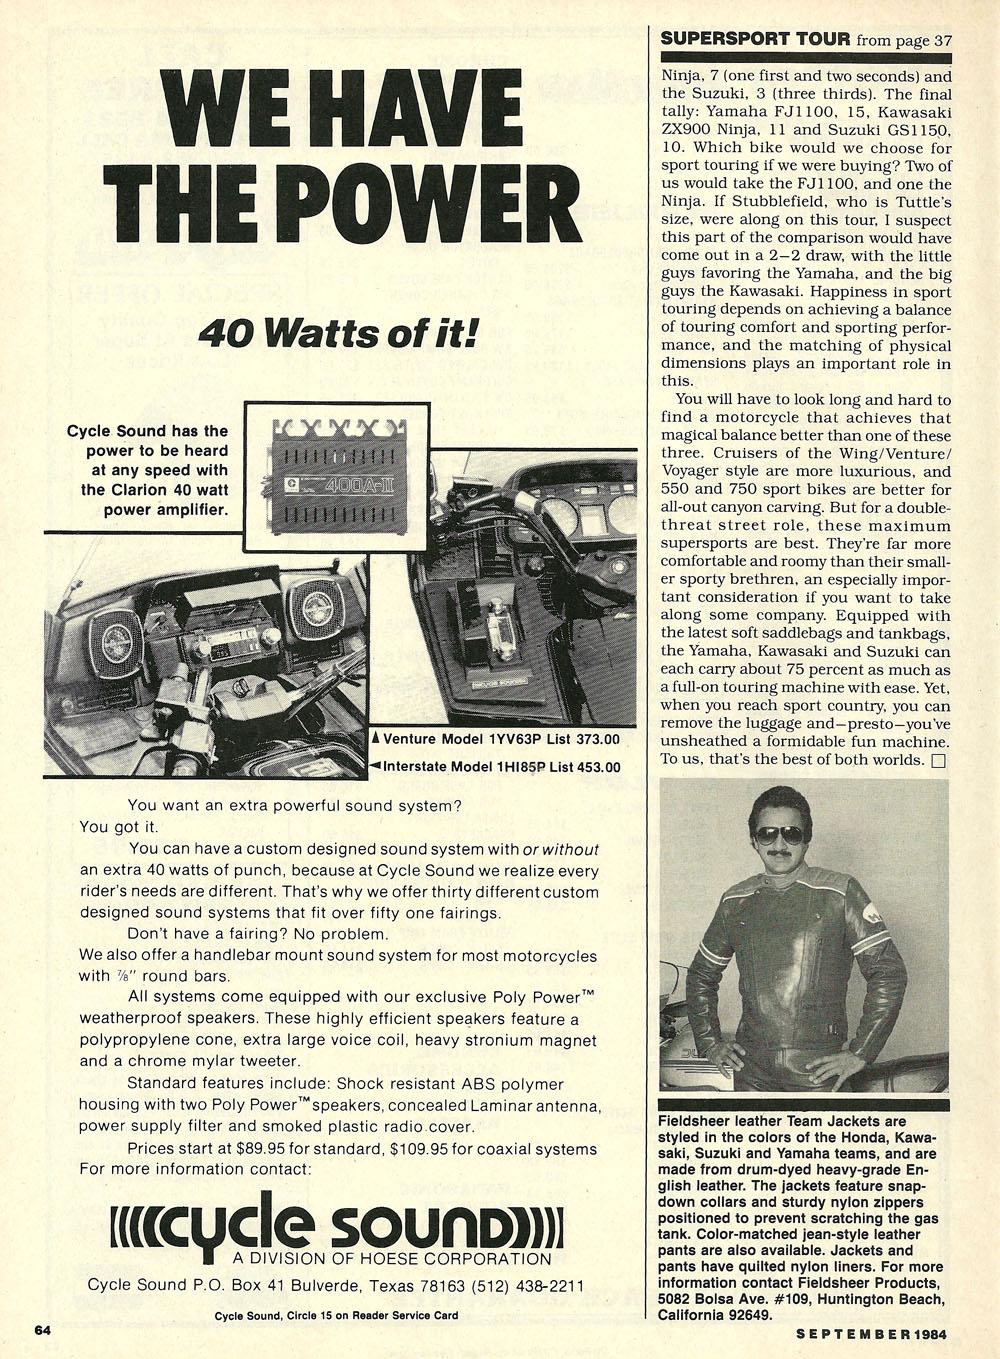 1984 fj1100 zx900 gs1150 road test 07.jpg